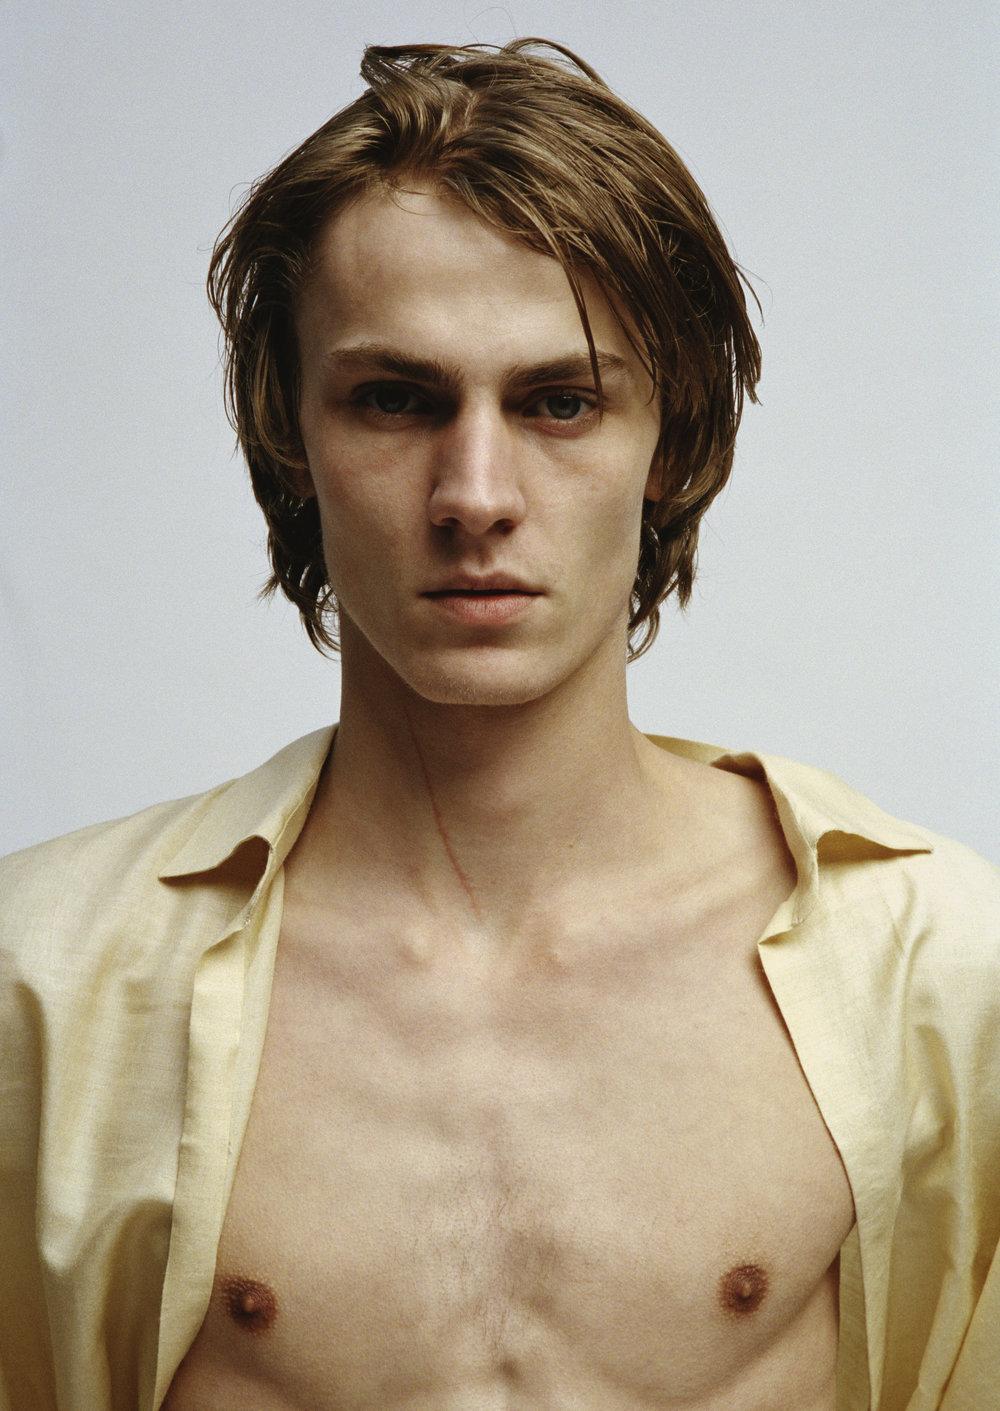 Fabien-Kruszelnicki-Ludovic-de-Saint-Sernin-Ansinth_Page_06_Image_0003.jpg